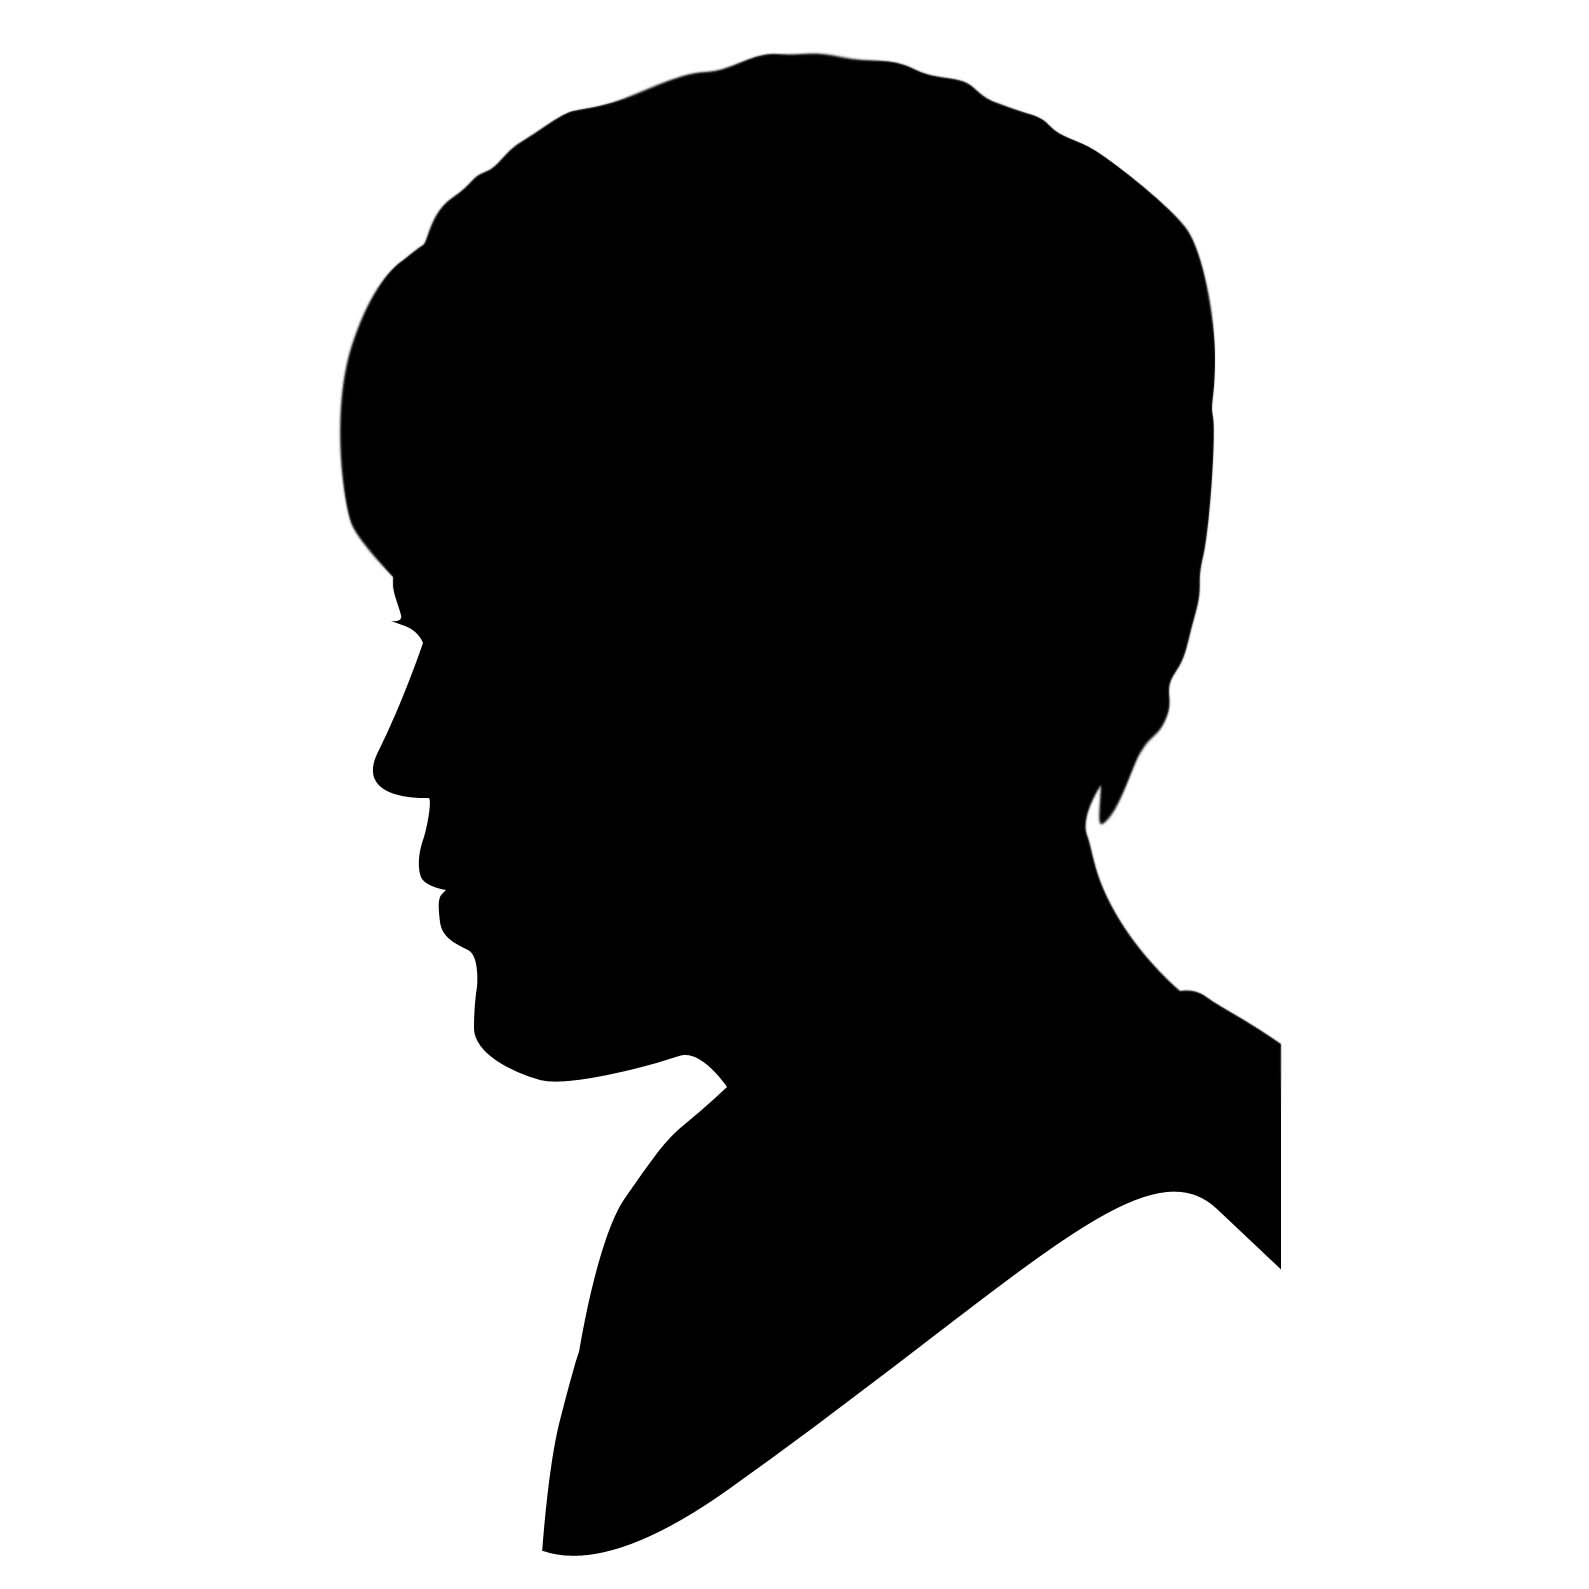 jasa siluet foto dan wajah jasa siluet digital foto dan wajah jasa siluet foto dan wajah jasa